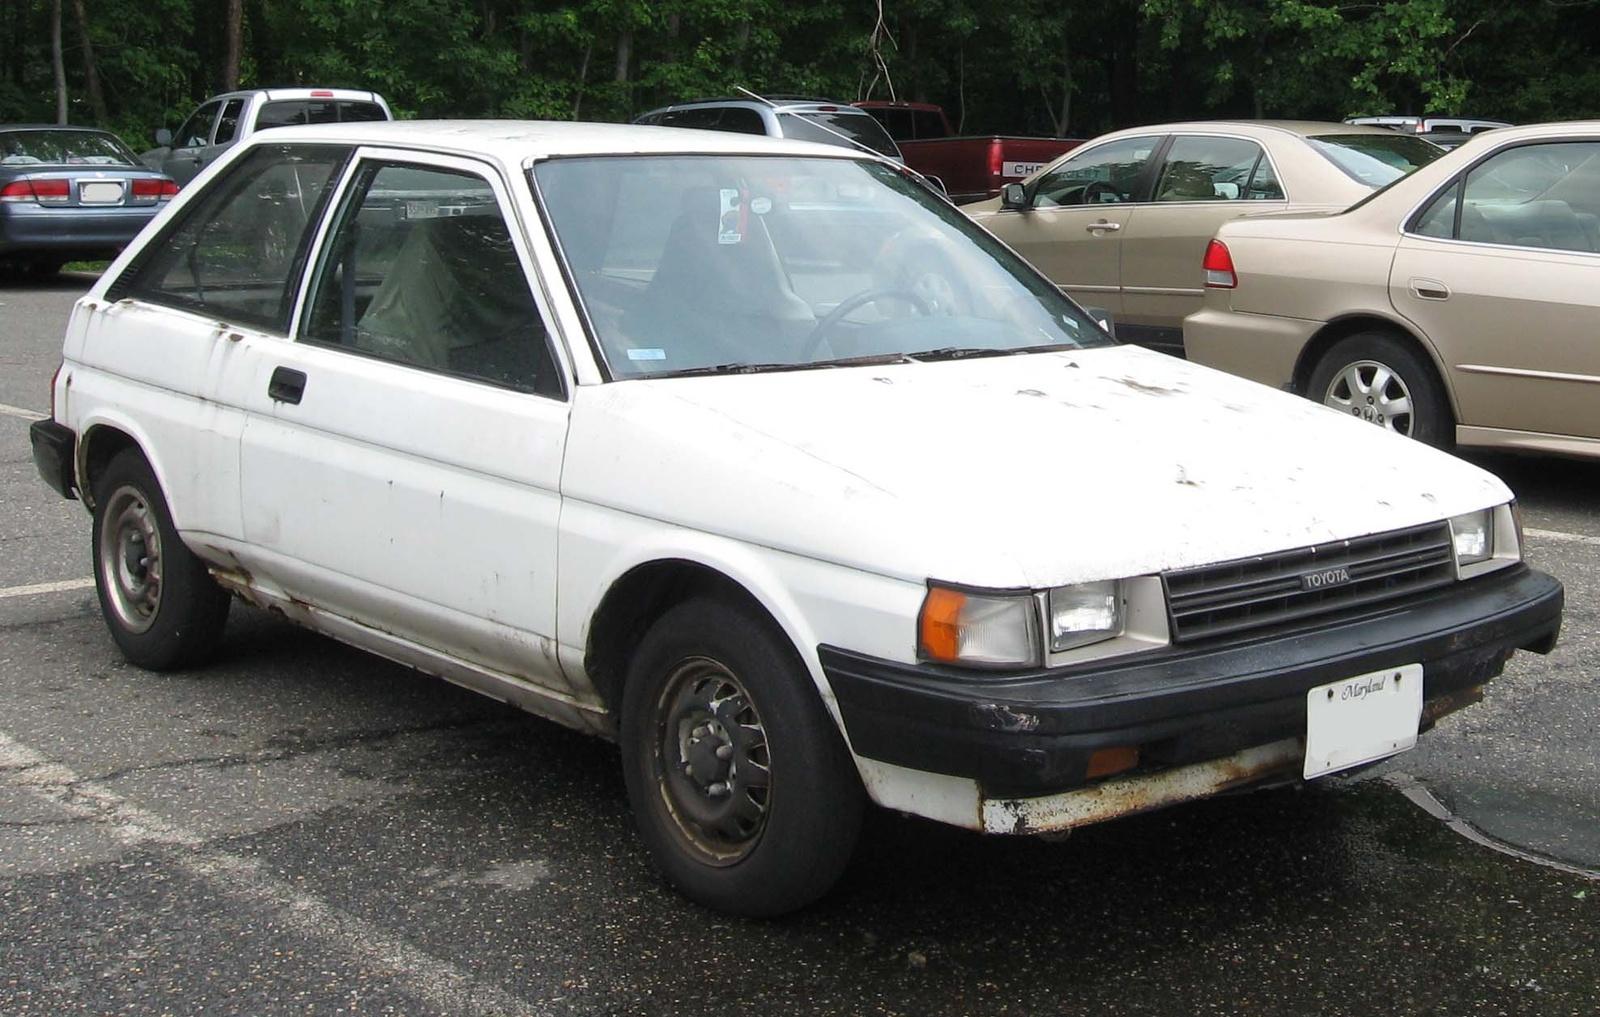 File 1990 Toyota Celica GT4  ST185H BLMVZ  liftback 01 likewise 1992 Toyota Corolla together with Toyota Corolla  E80 also 1992 Toyota Corolla additionally Toyota Corolla 3 Doors 1992. on toyota corolla liftback 1992